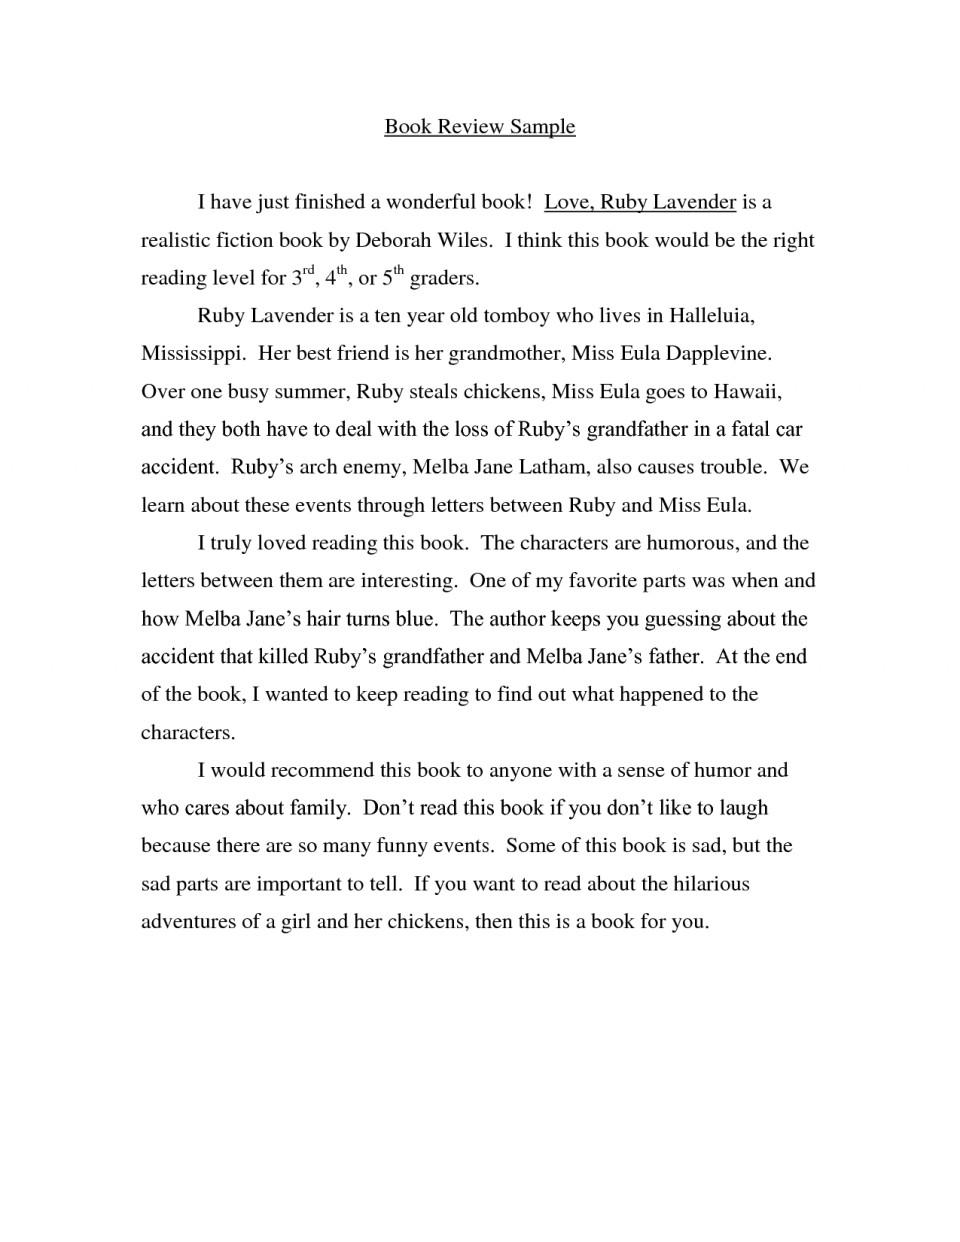 004 Essay Example Book Impressive Report Sample Examples Of Literary 960